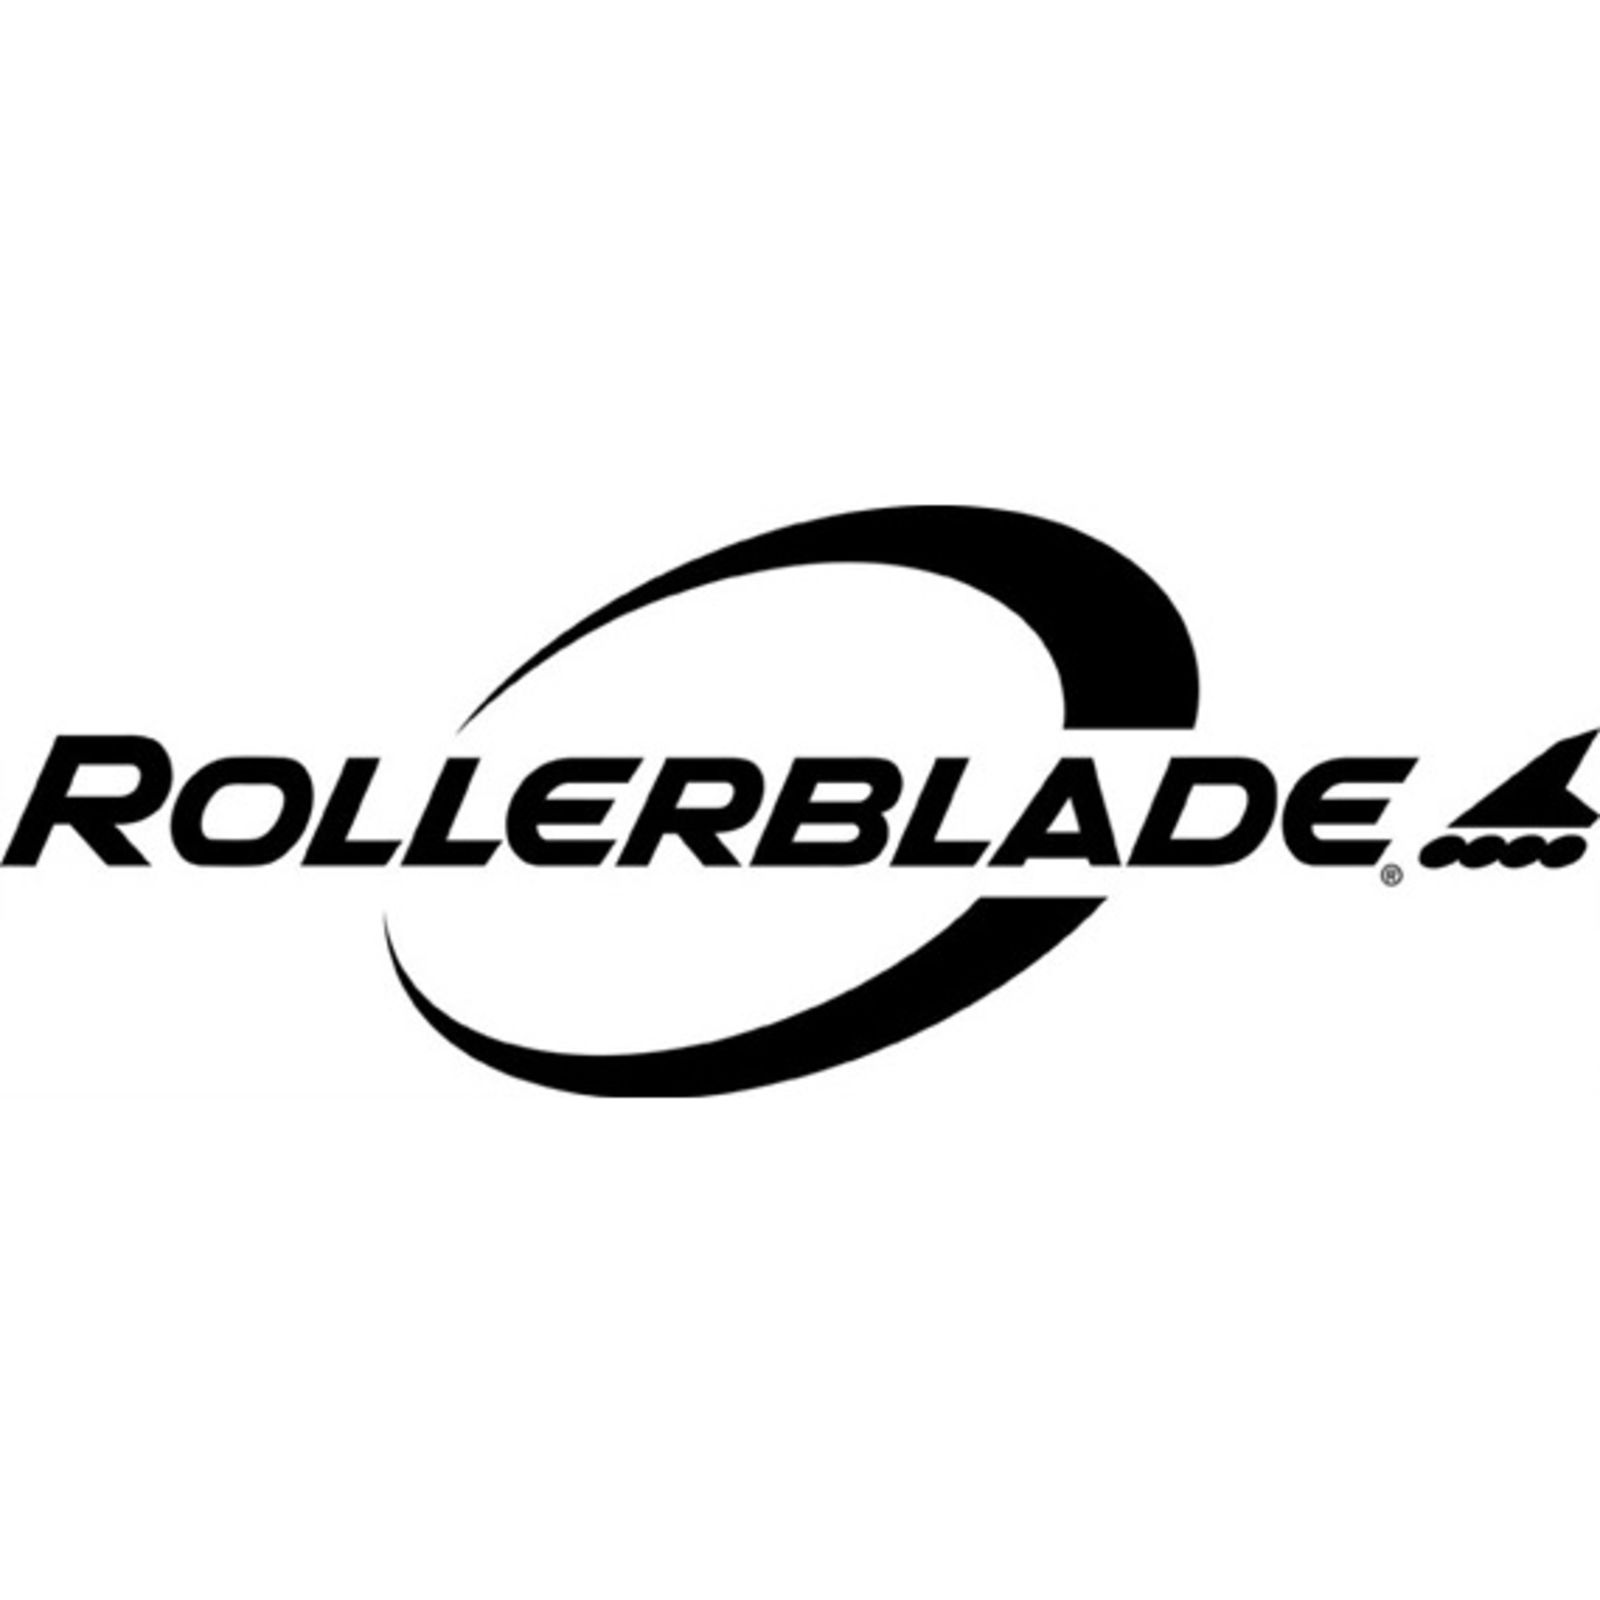 ROLLERBLADE®